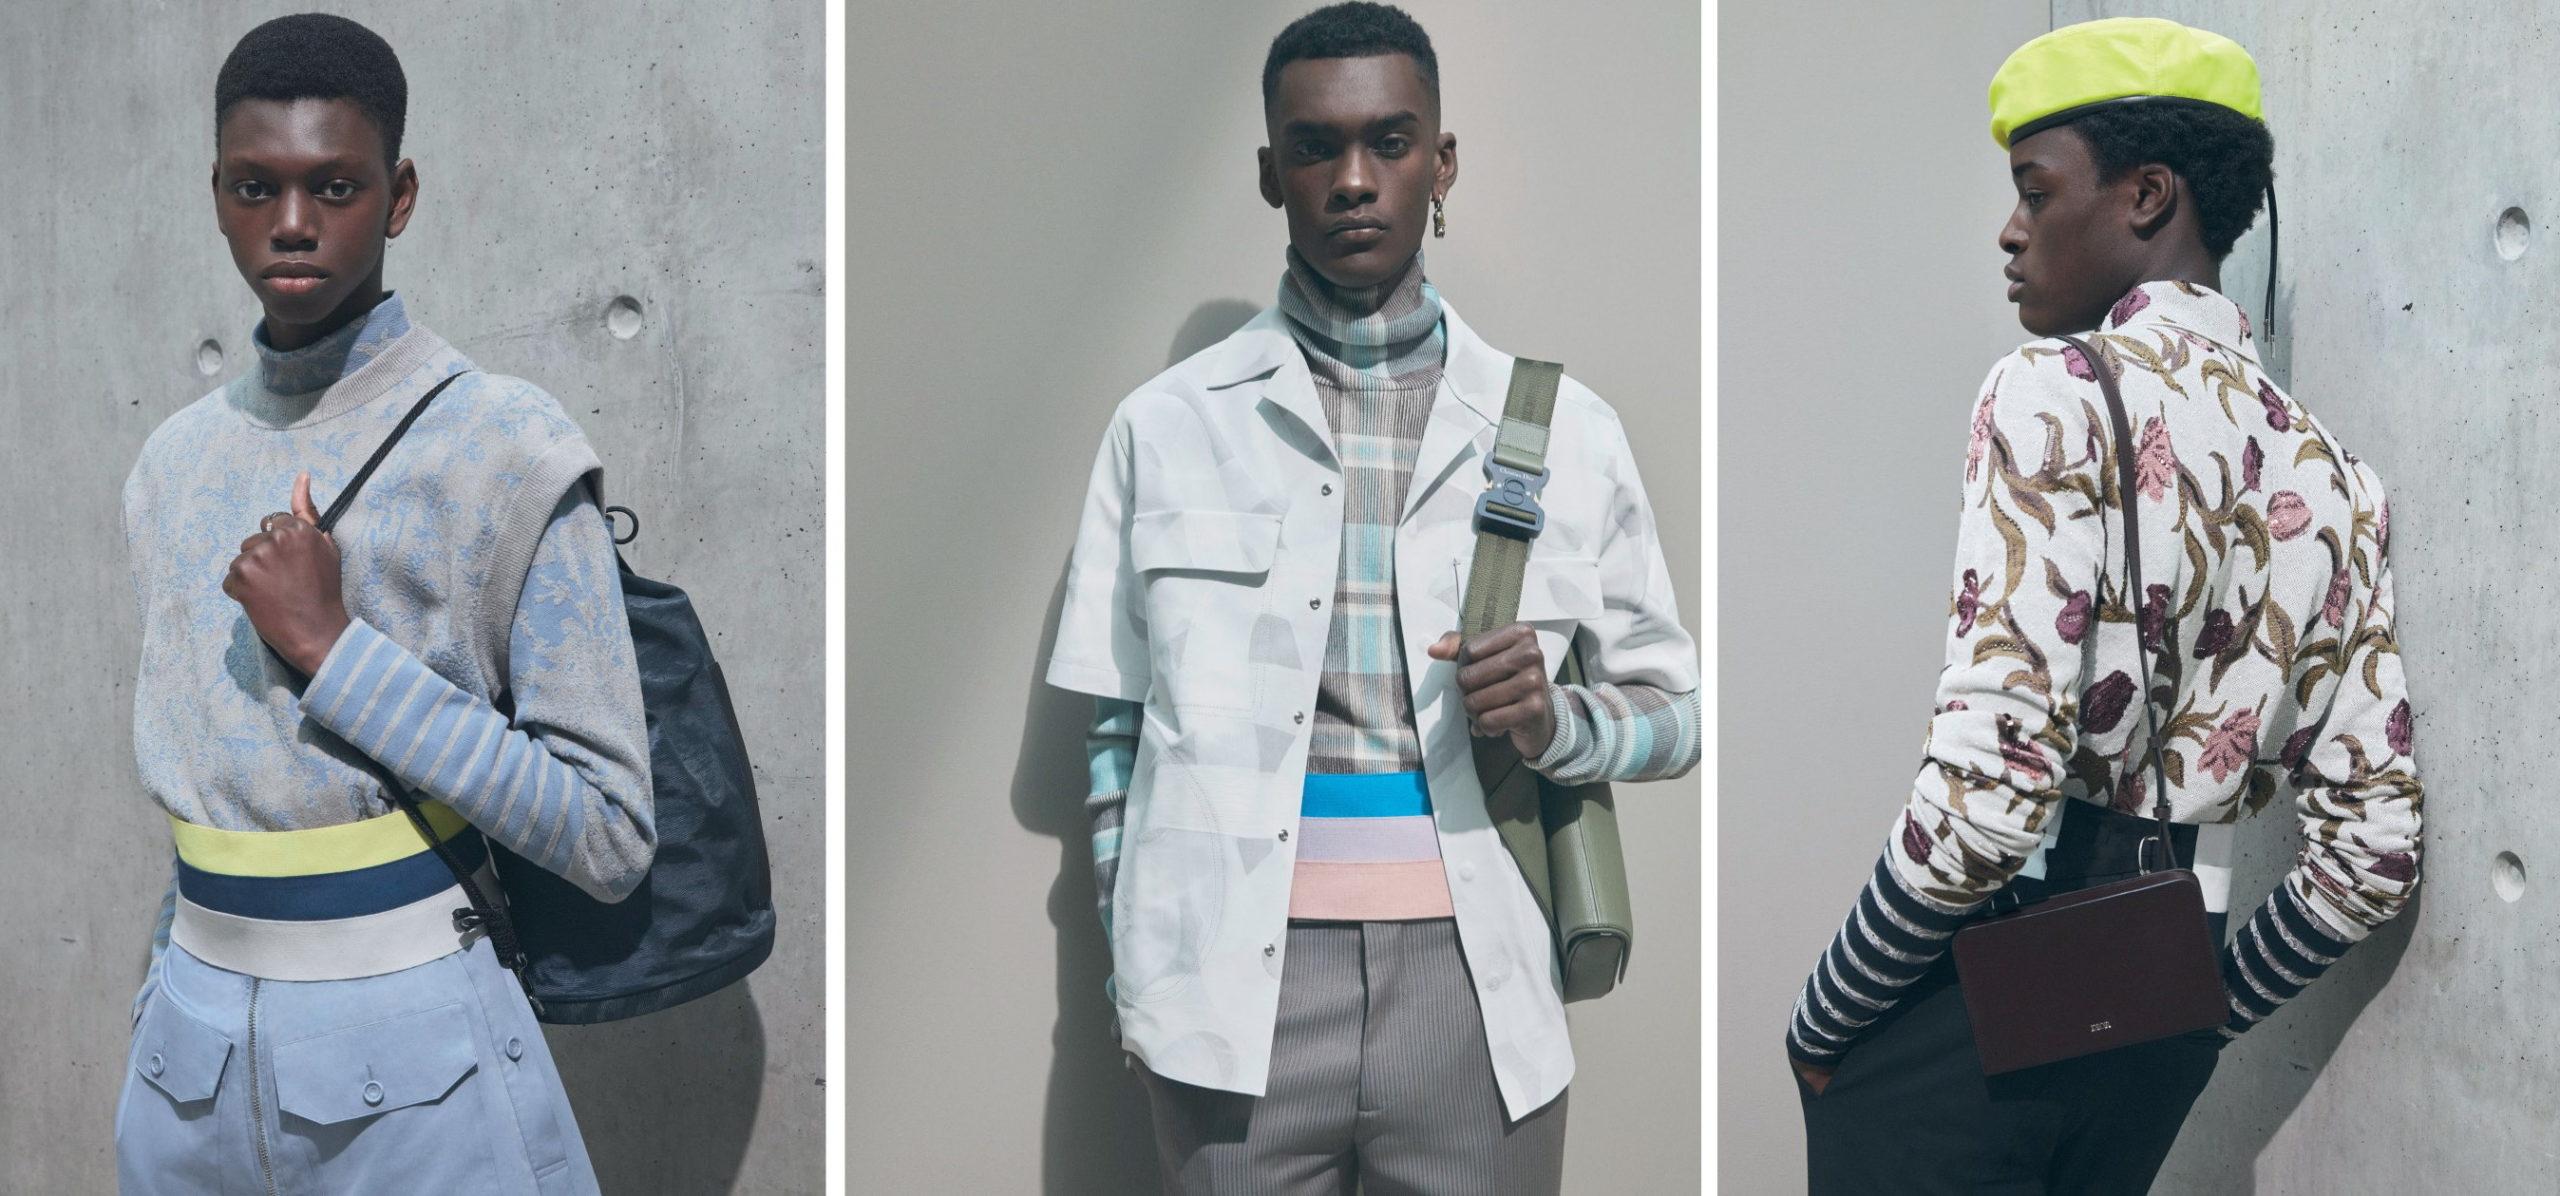 Dior Men's Summer 2021 Collection Is Kim Jones' Homage To Amoako Boafo